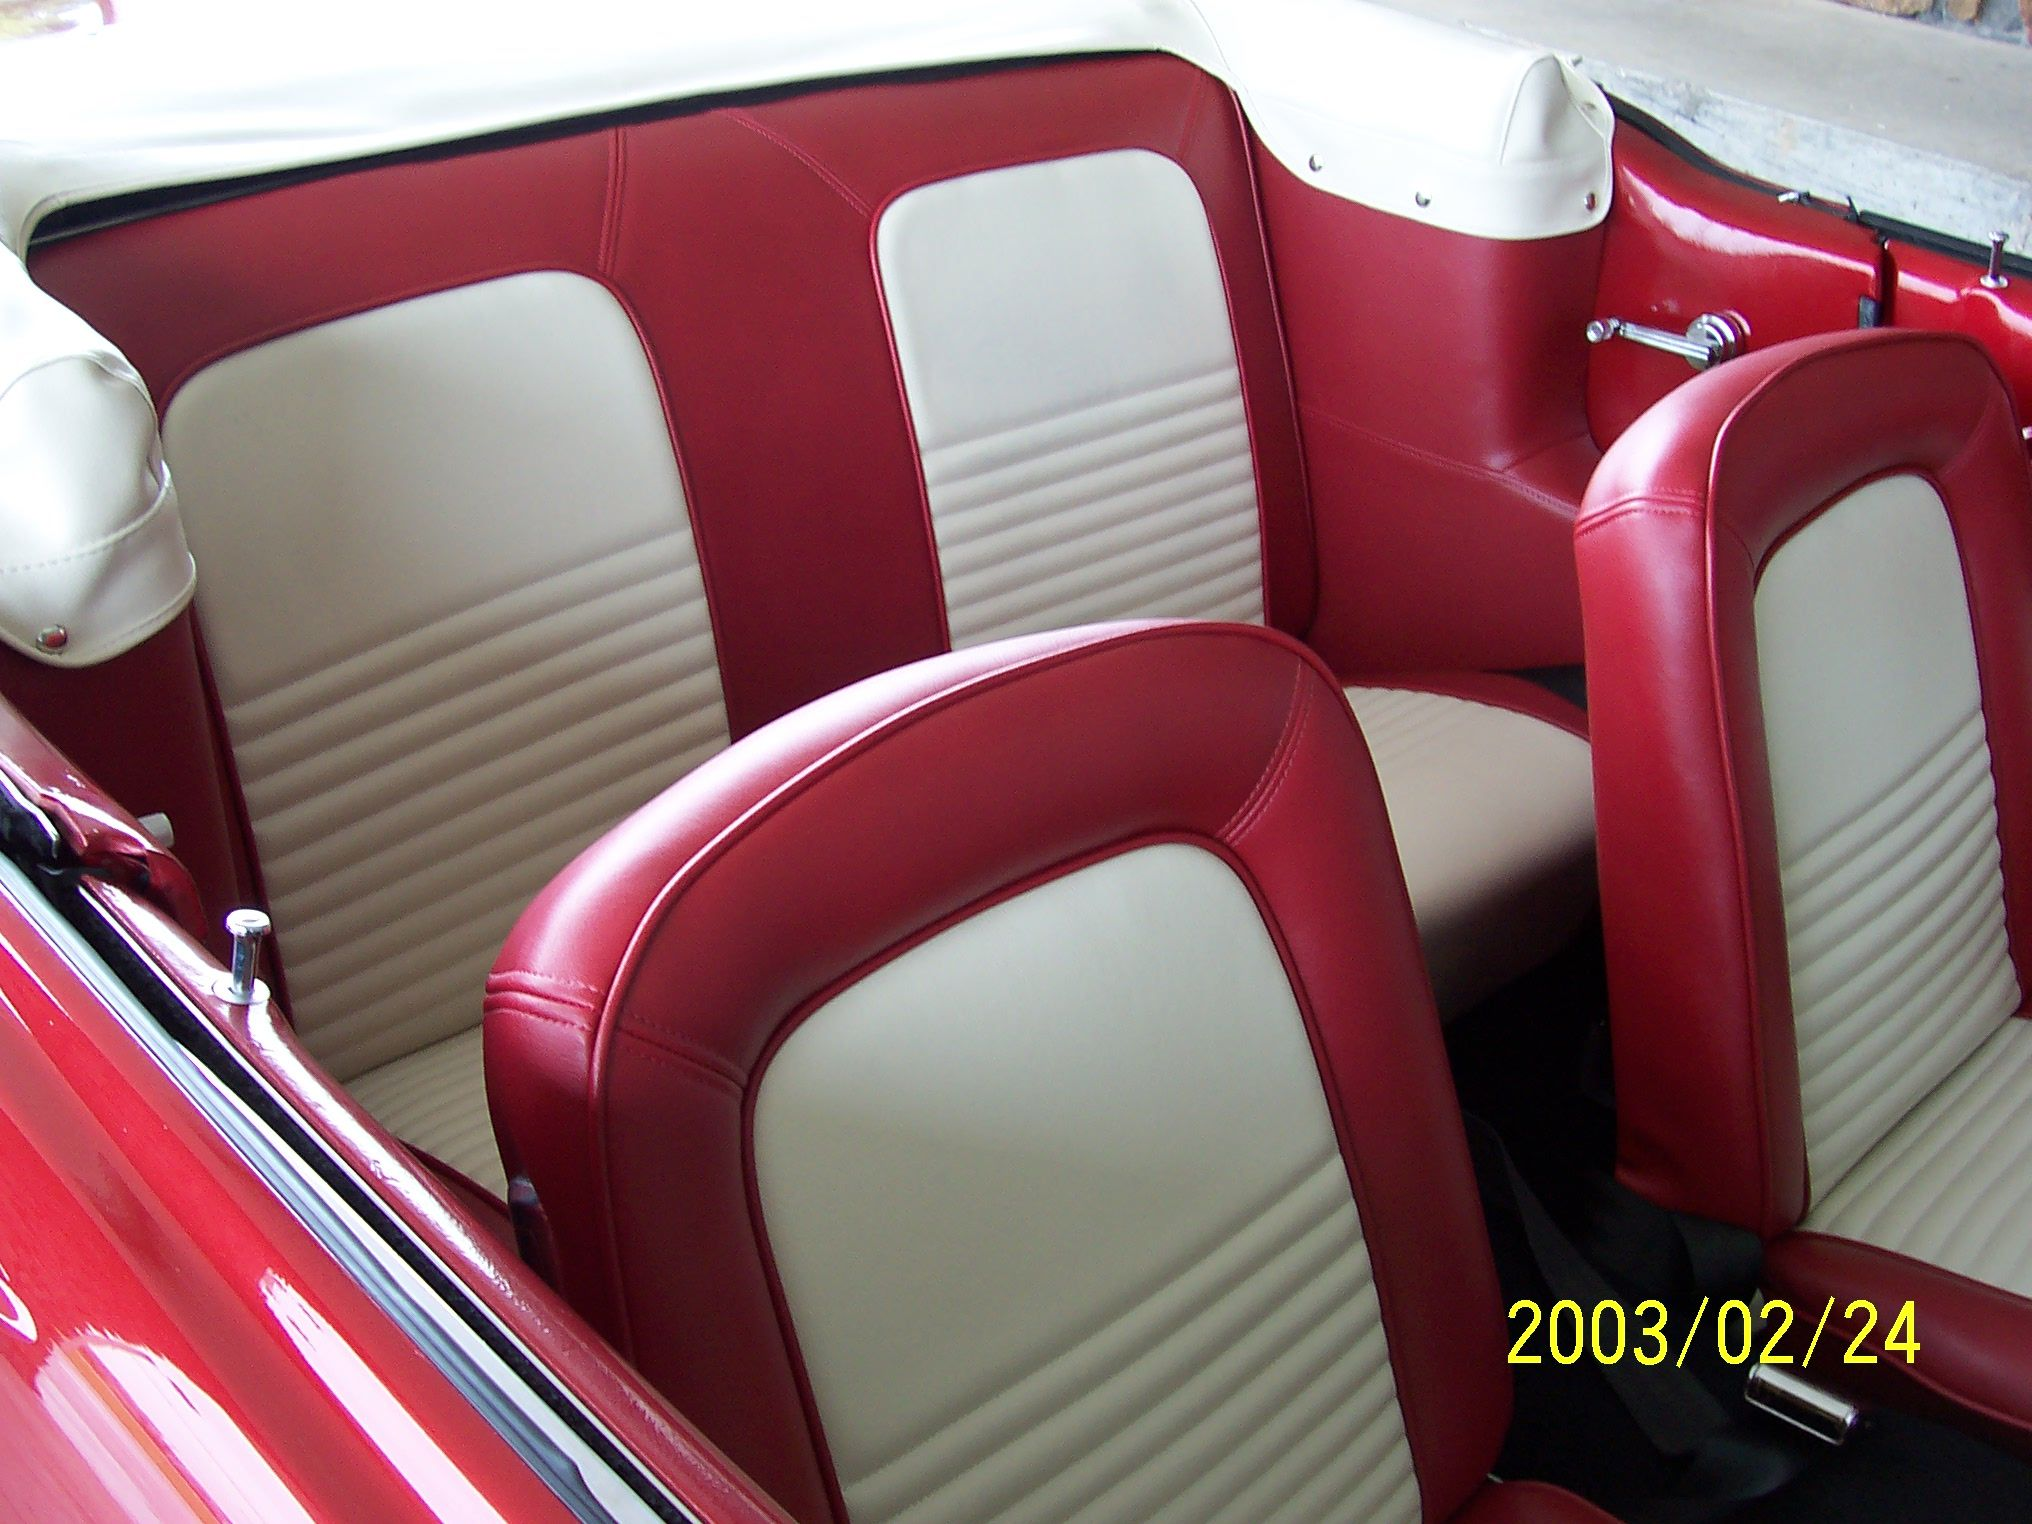 Pin By William Hicks On Restoration Custom Car Interior Car Upholstery Car Interior